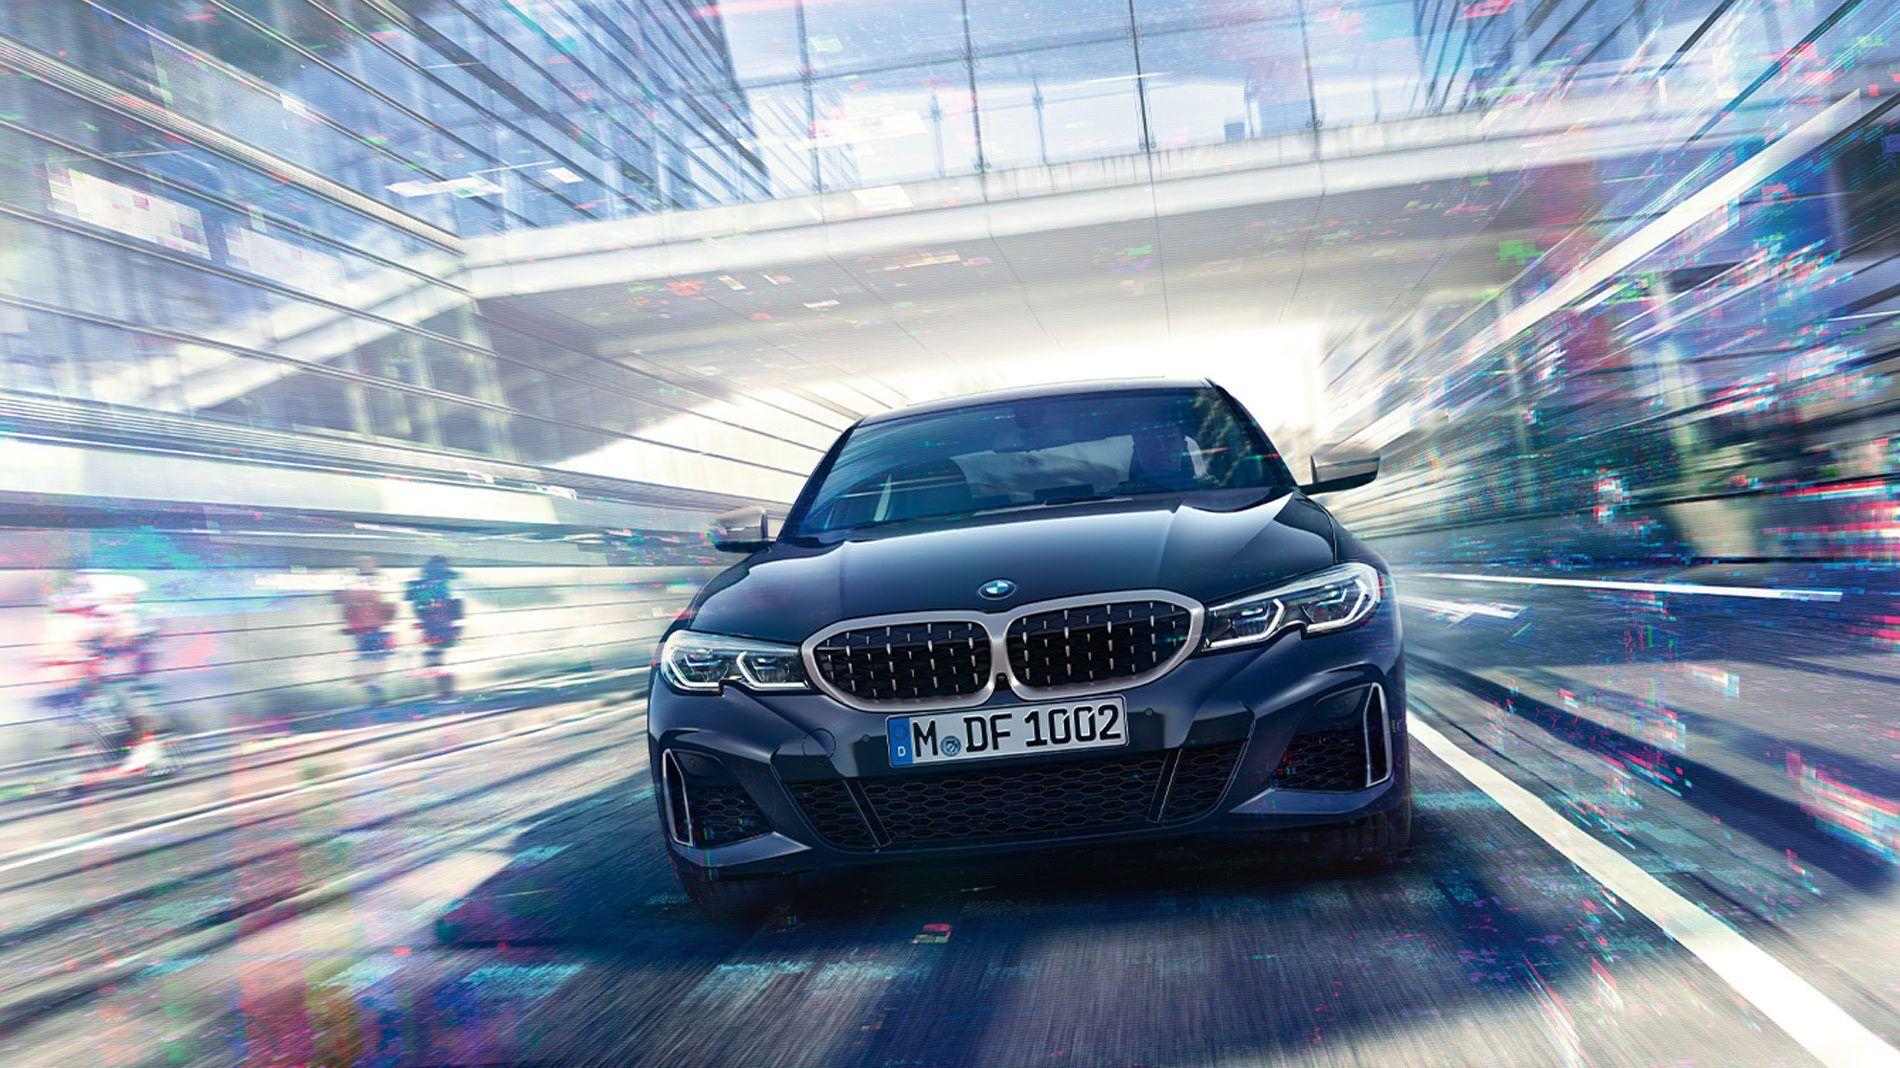 BMW M3 Sedan Hero Image